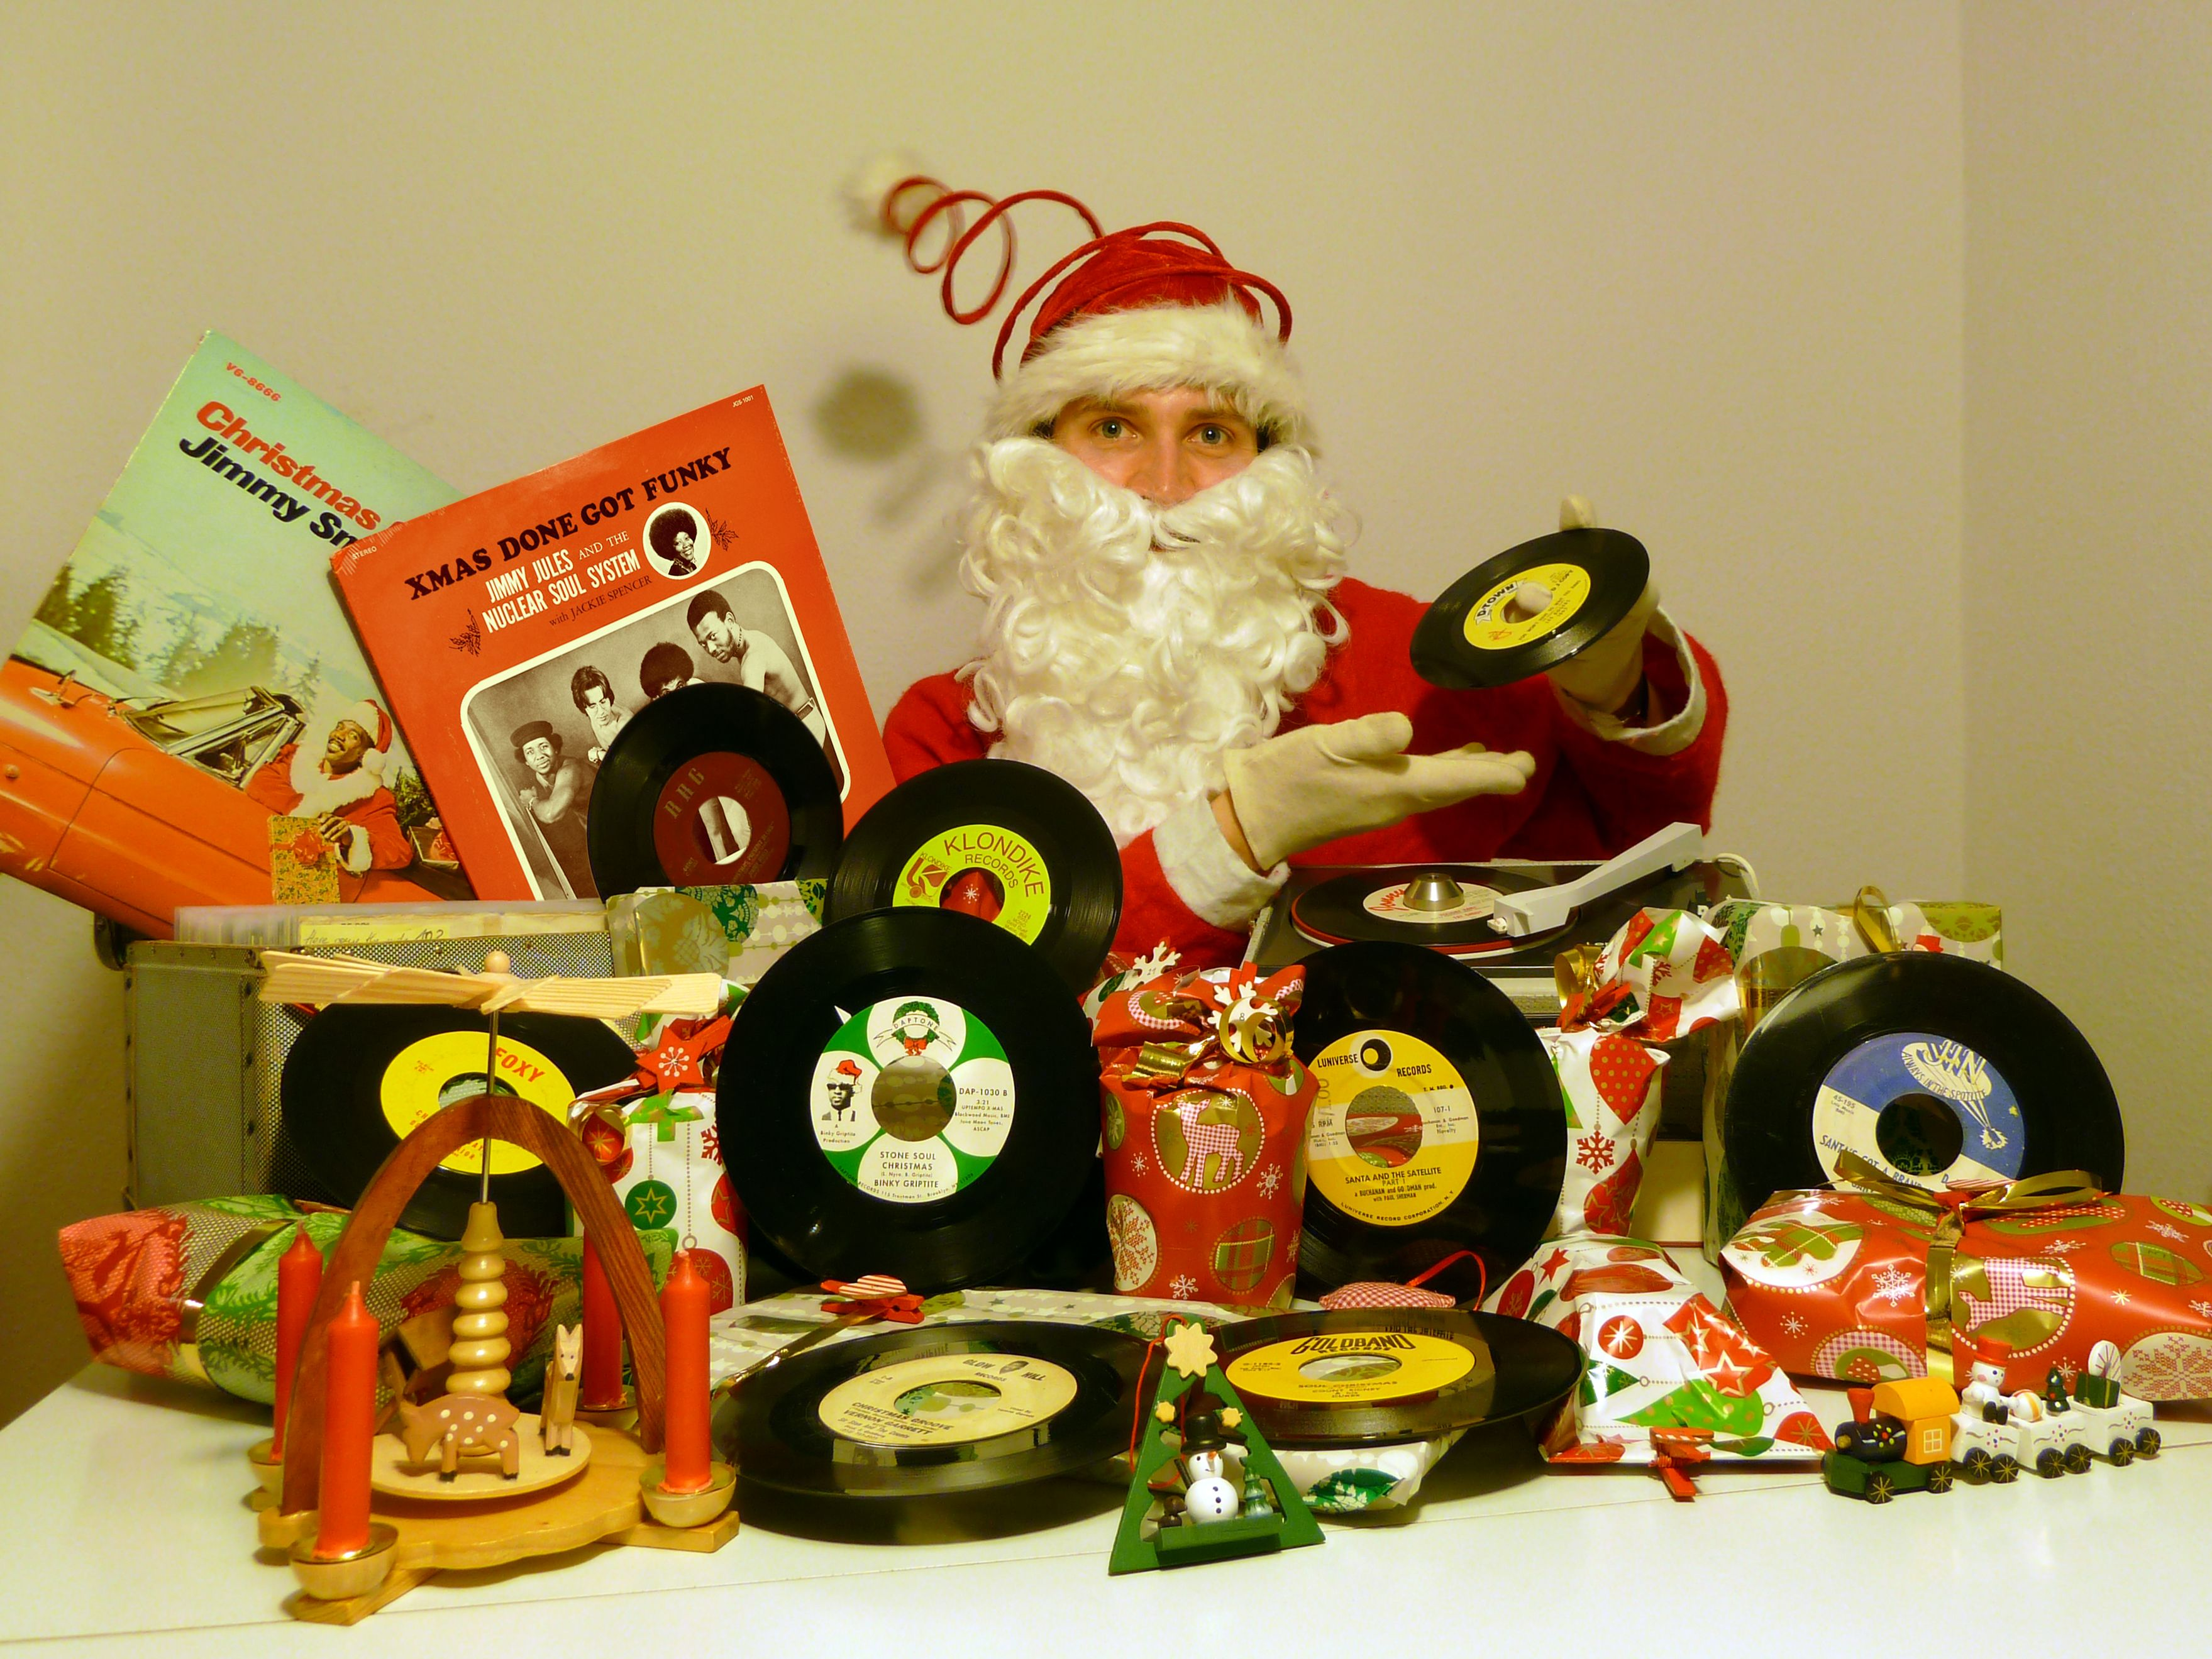 Pin by FuTurXTV on Funky Xmas - Happy New Year - Funk Gumbo Radio ...